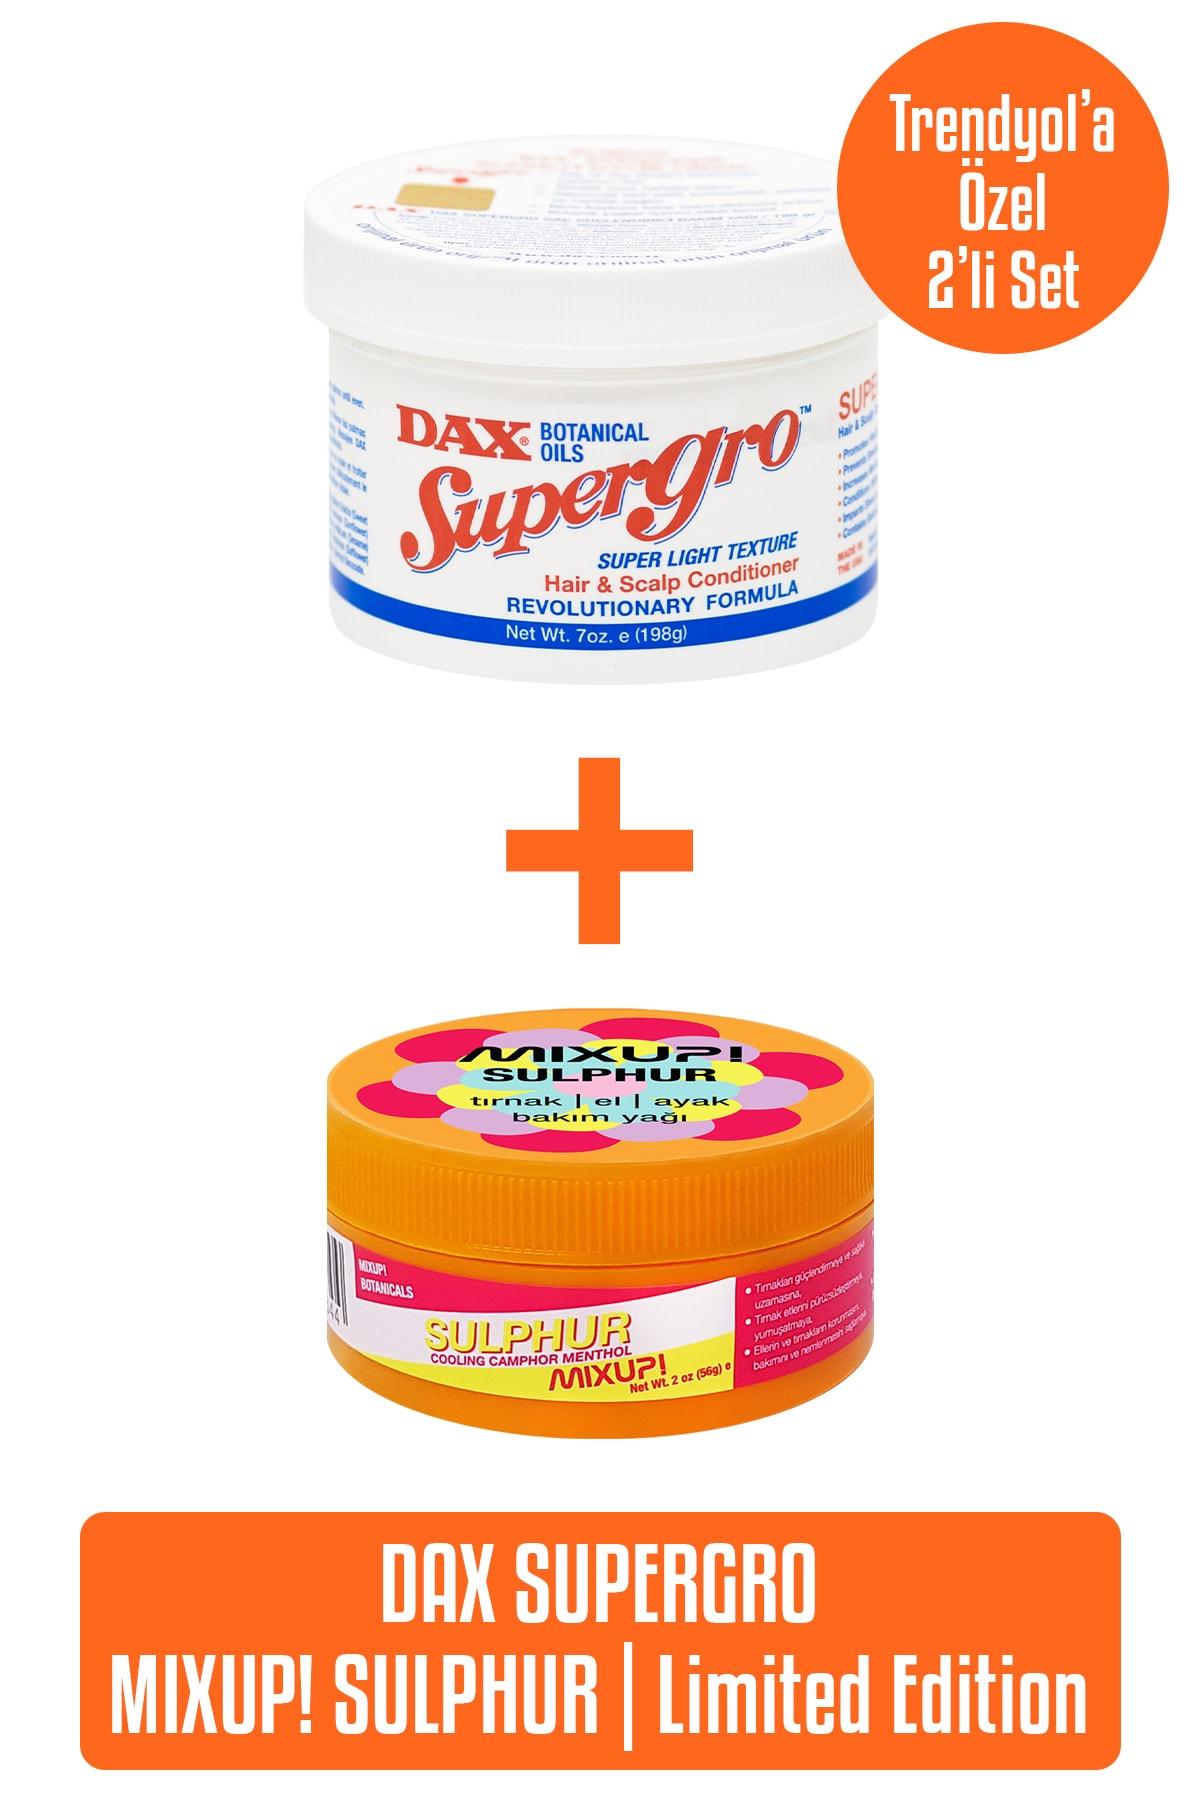 Dax Supergro 198 g - Yavaş Uzayan Saçlara Özel Saç Bakım Yağı X Limited Edition Mixup! Sulphur 56 g 0